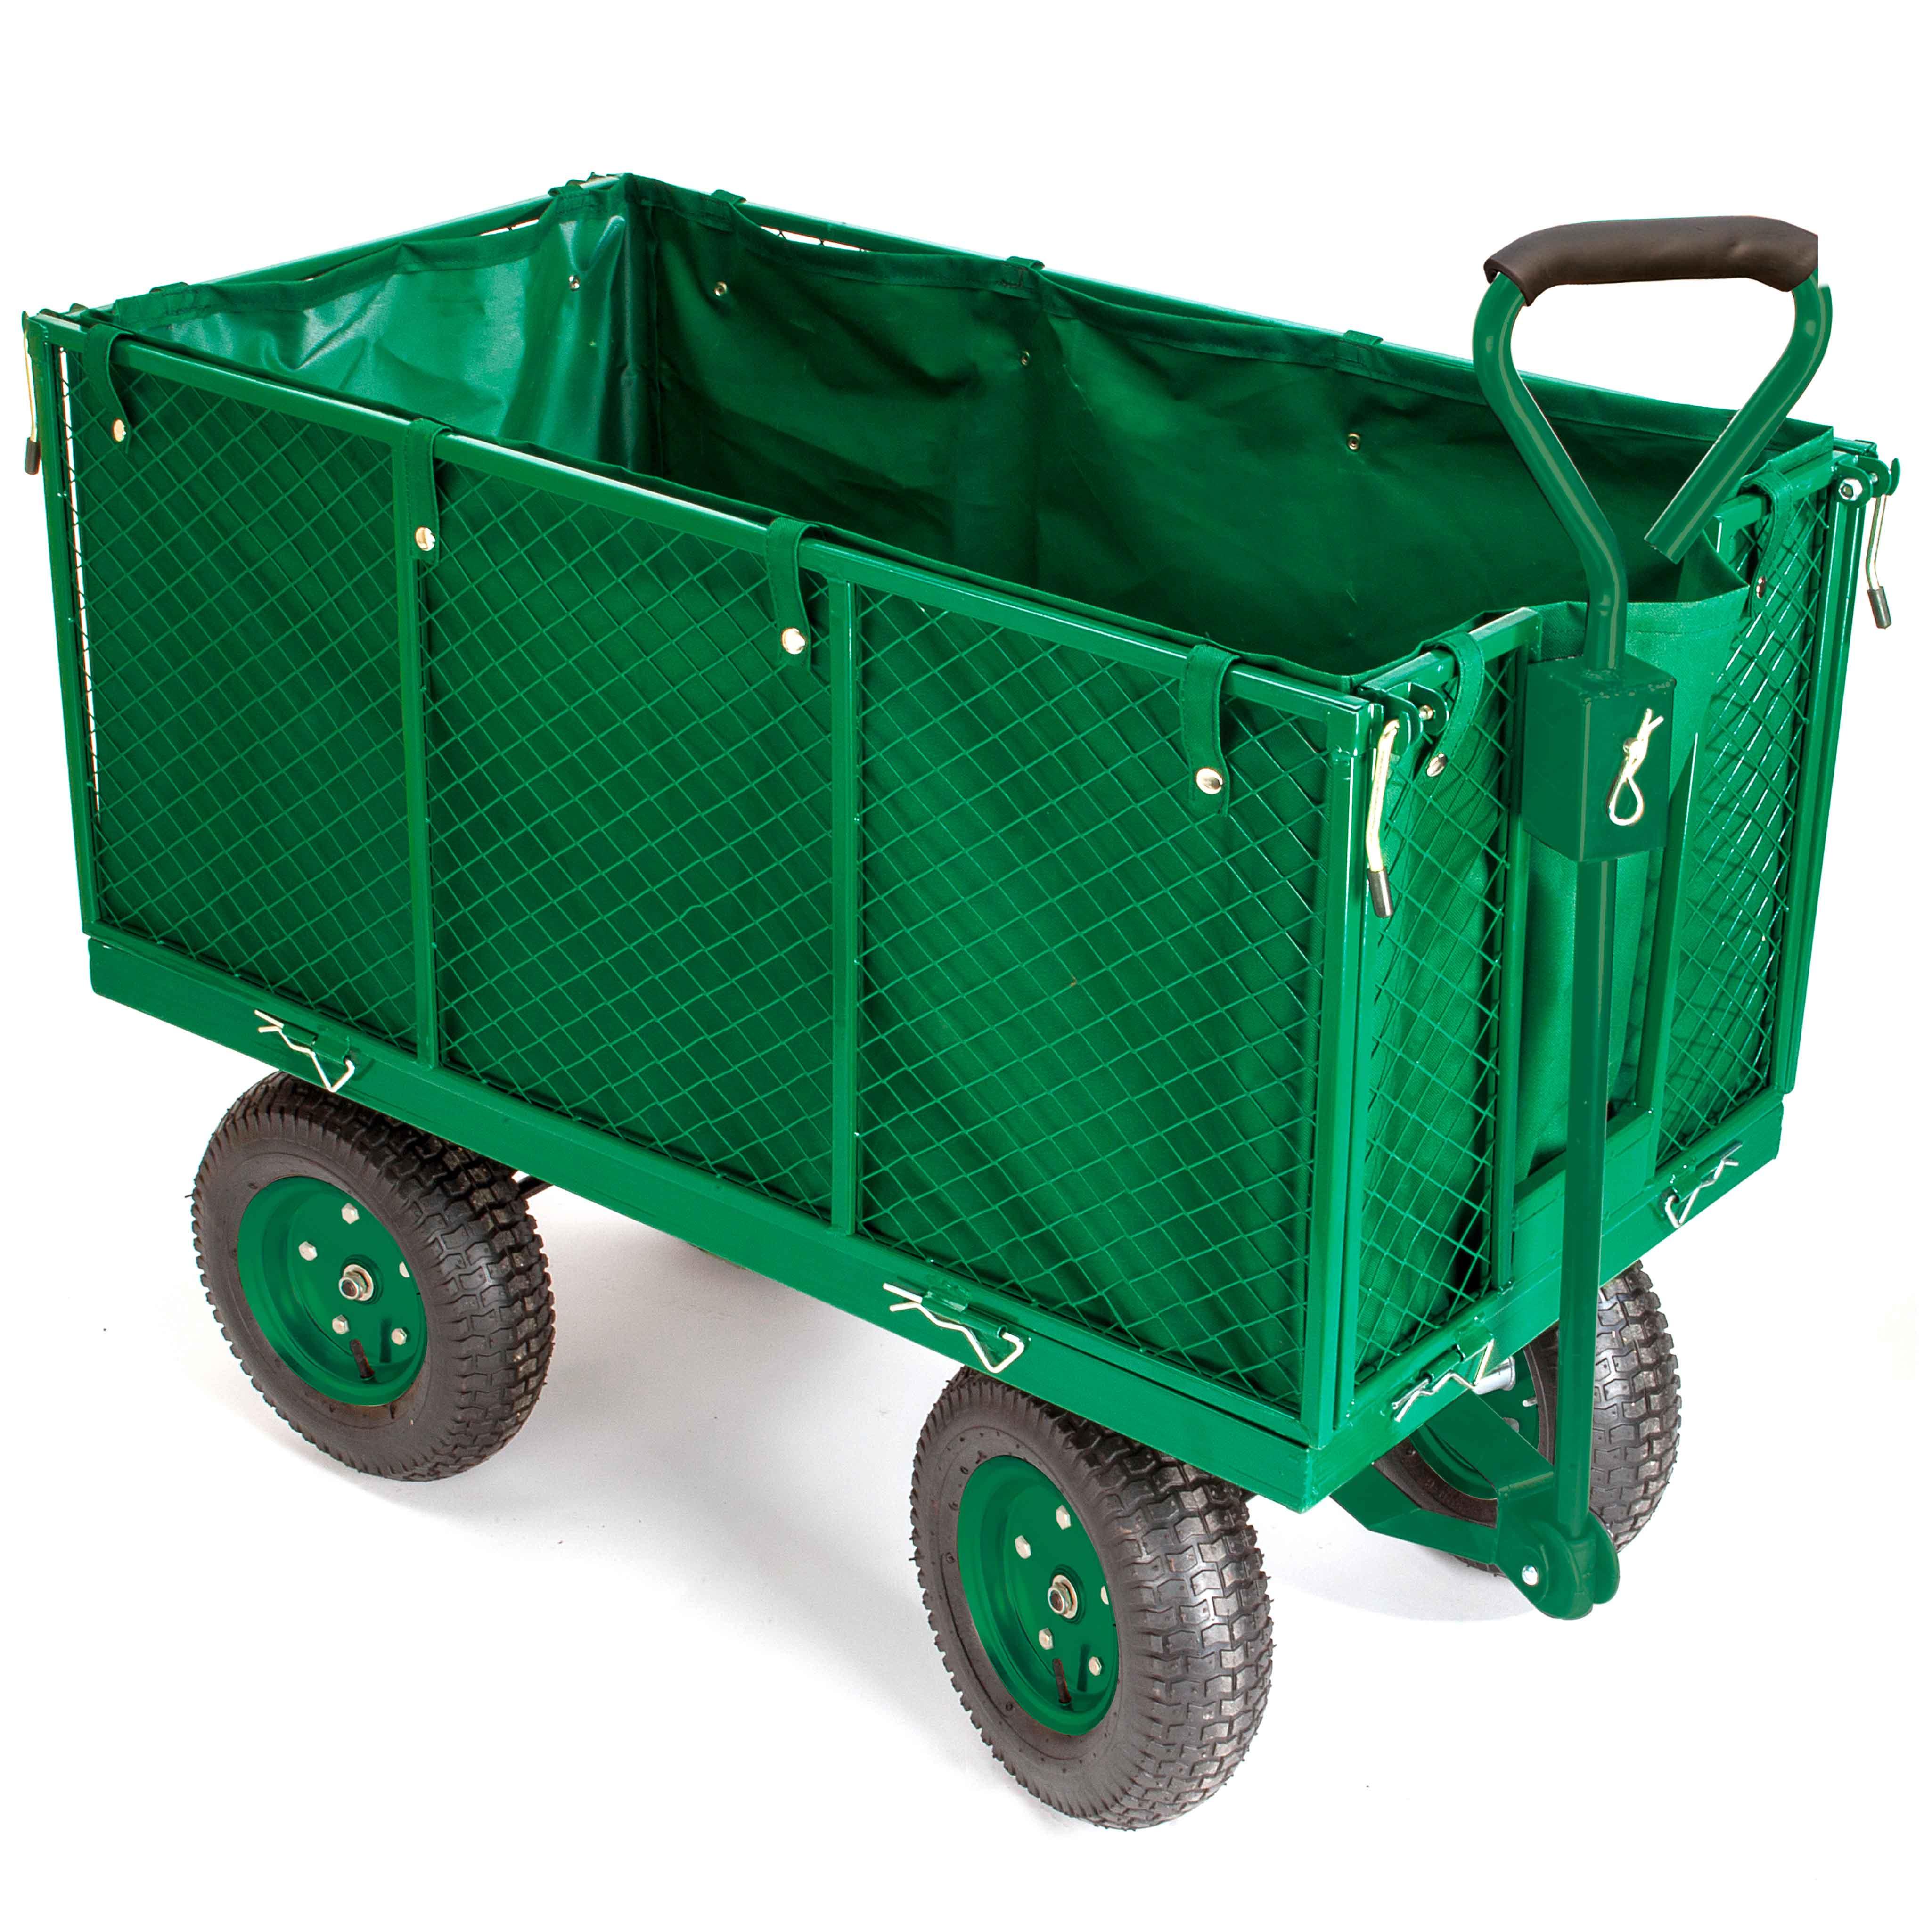 chariot de jardin b ch grillag 4 roues distriartisan. Black Bedroom Furniture Sets. Home Design Ideas